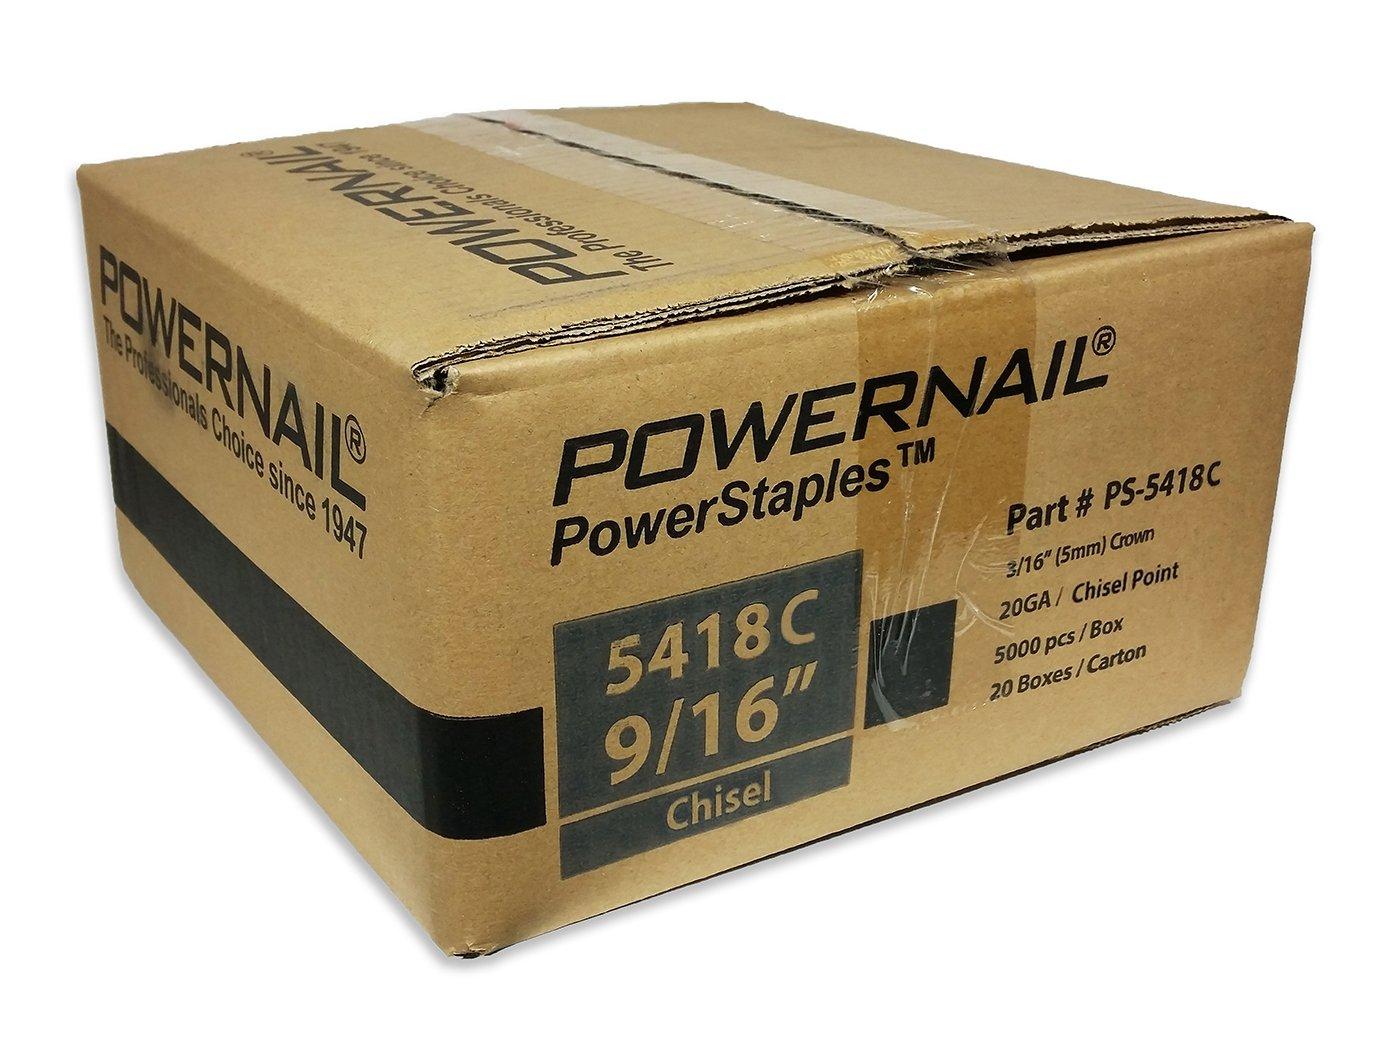 Powernail 20ga Chisel Point Staple. 3/16''crown x 9/16''long. Case of 20 boxes (5000ct per box)